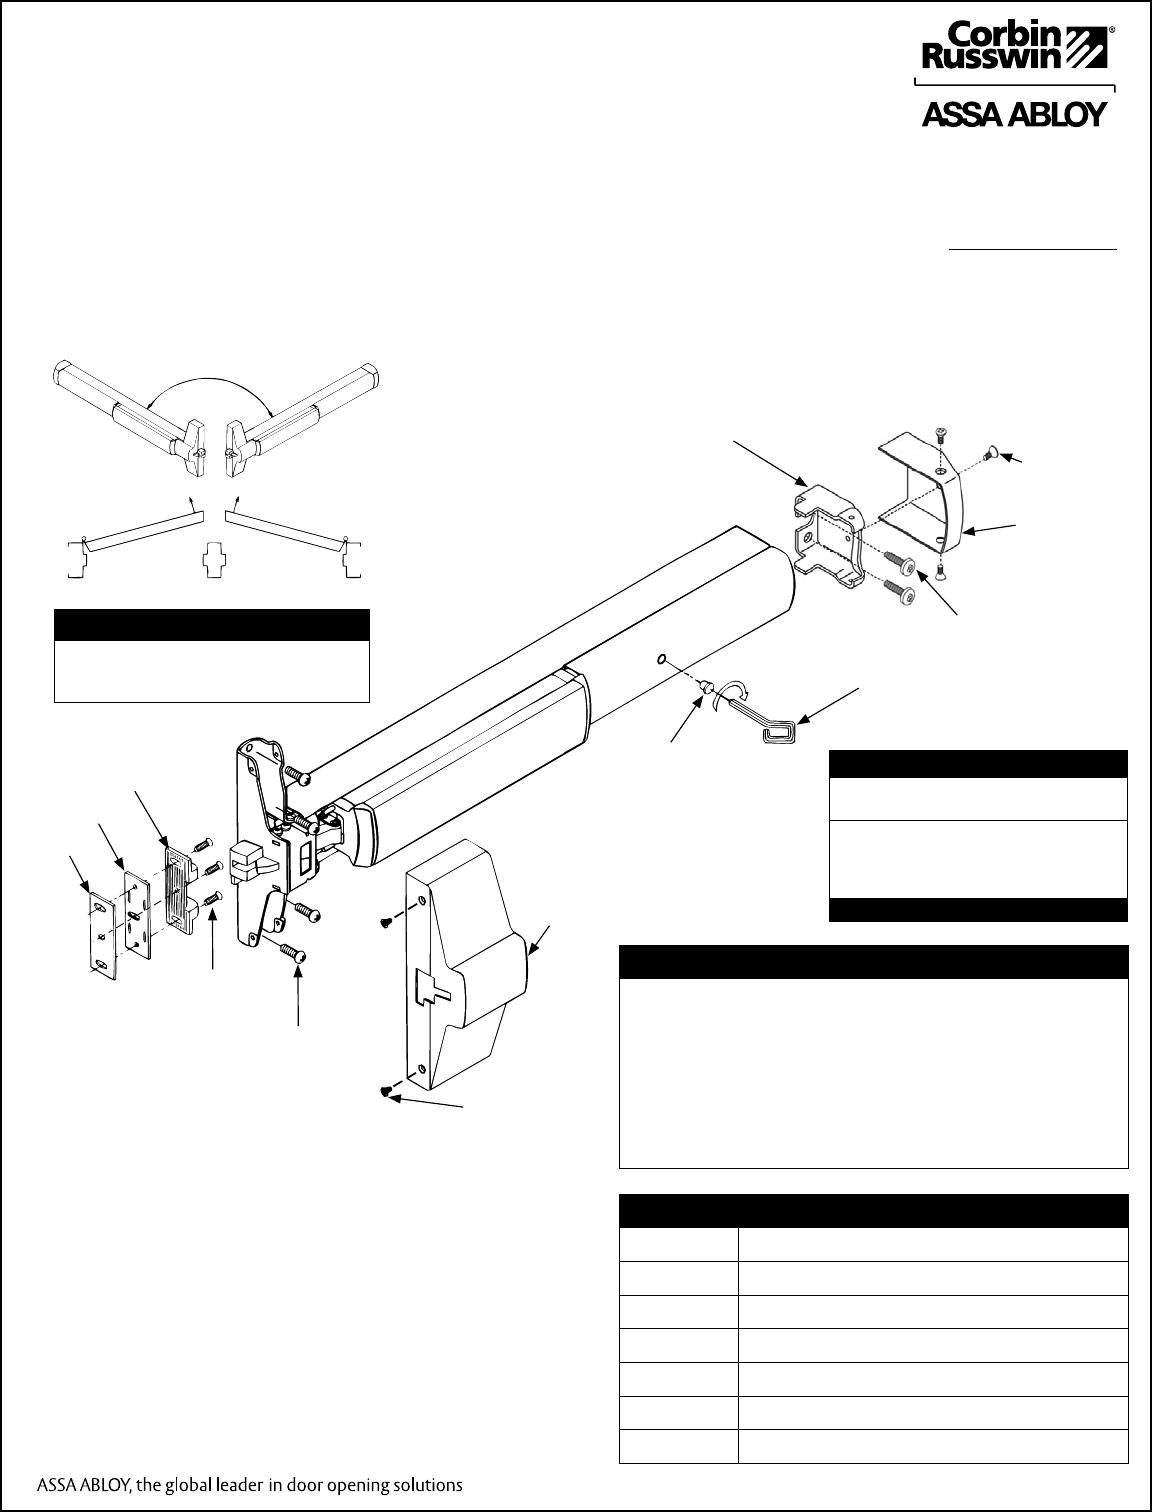 Wiring Diagram Ed5200s